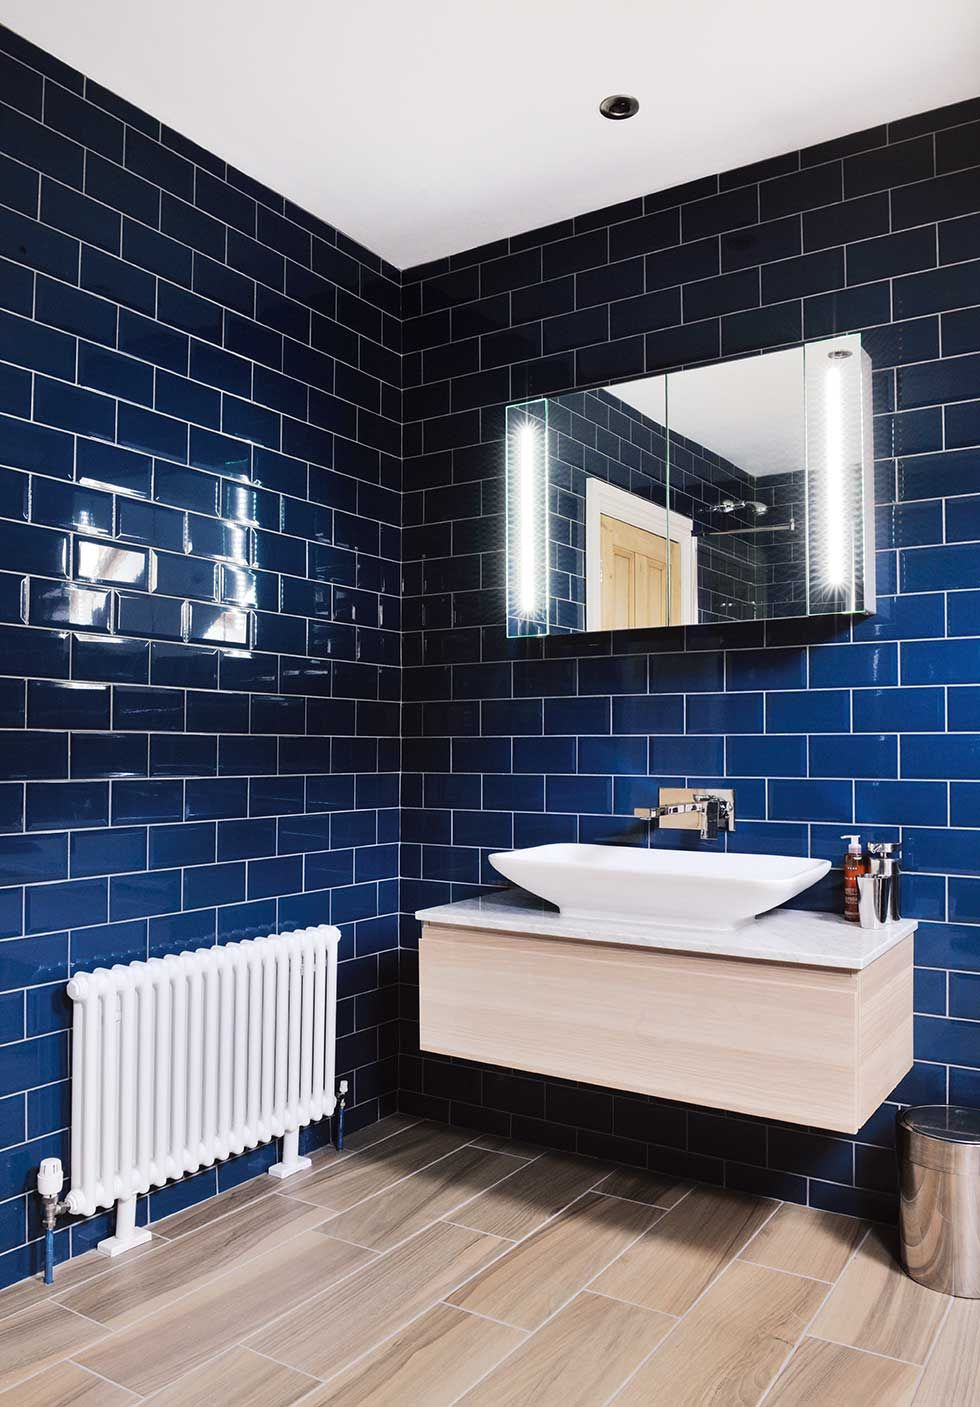 blue tiled bathroom with wooden sink | Bathroom | Pinterest | Sinks ...